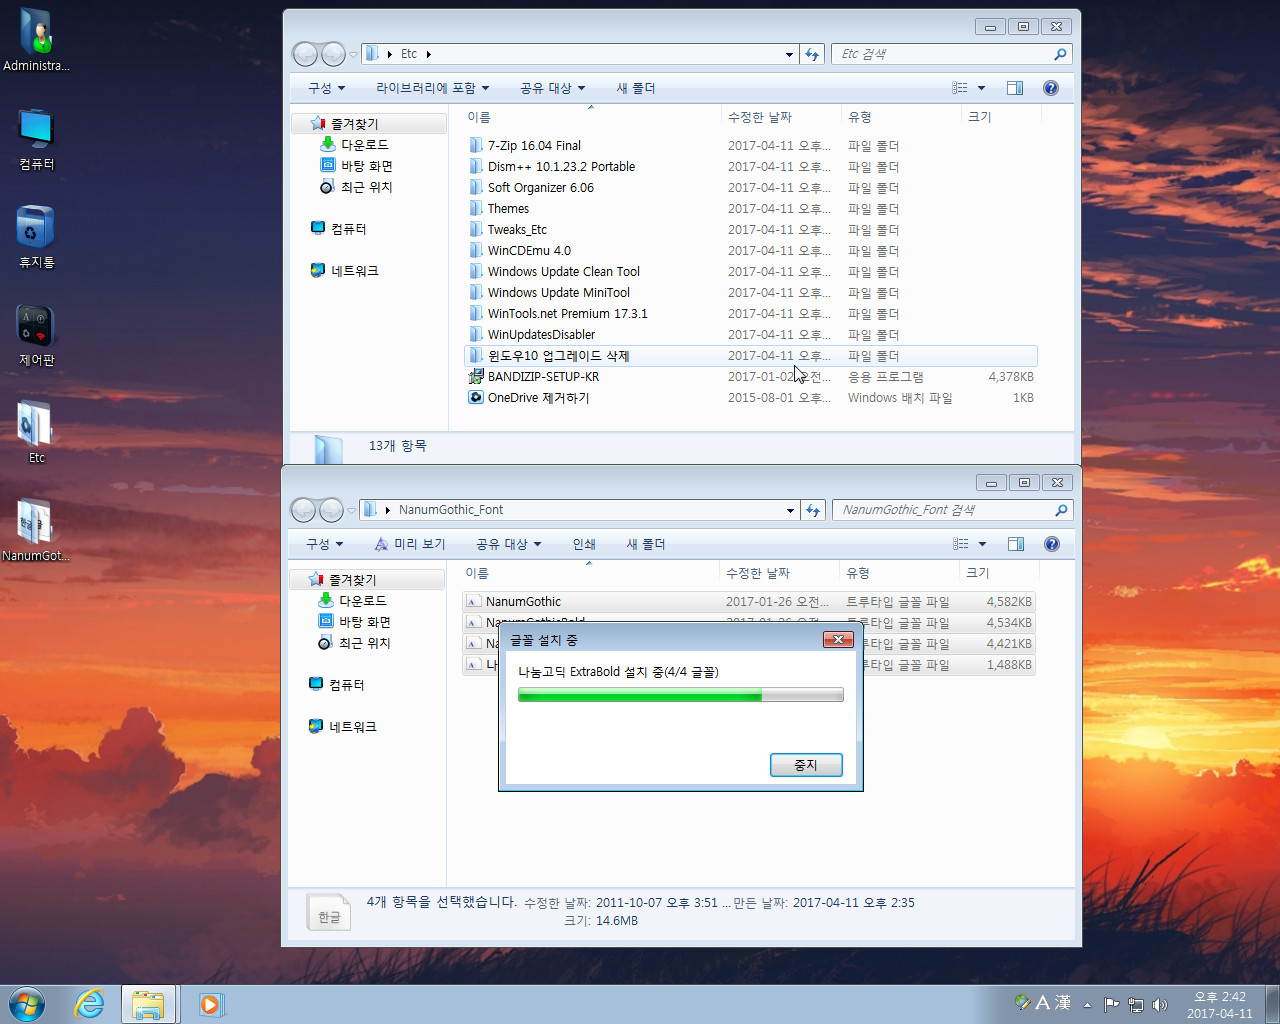 Windows 7 Ultimate_x64_Lite_KO_KY_OldMaC11.jpg